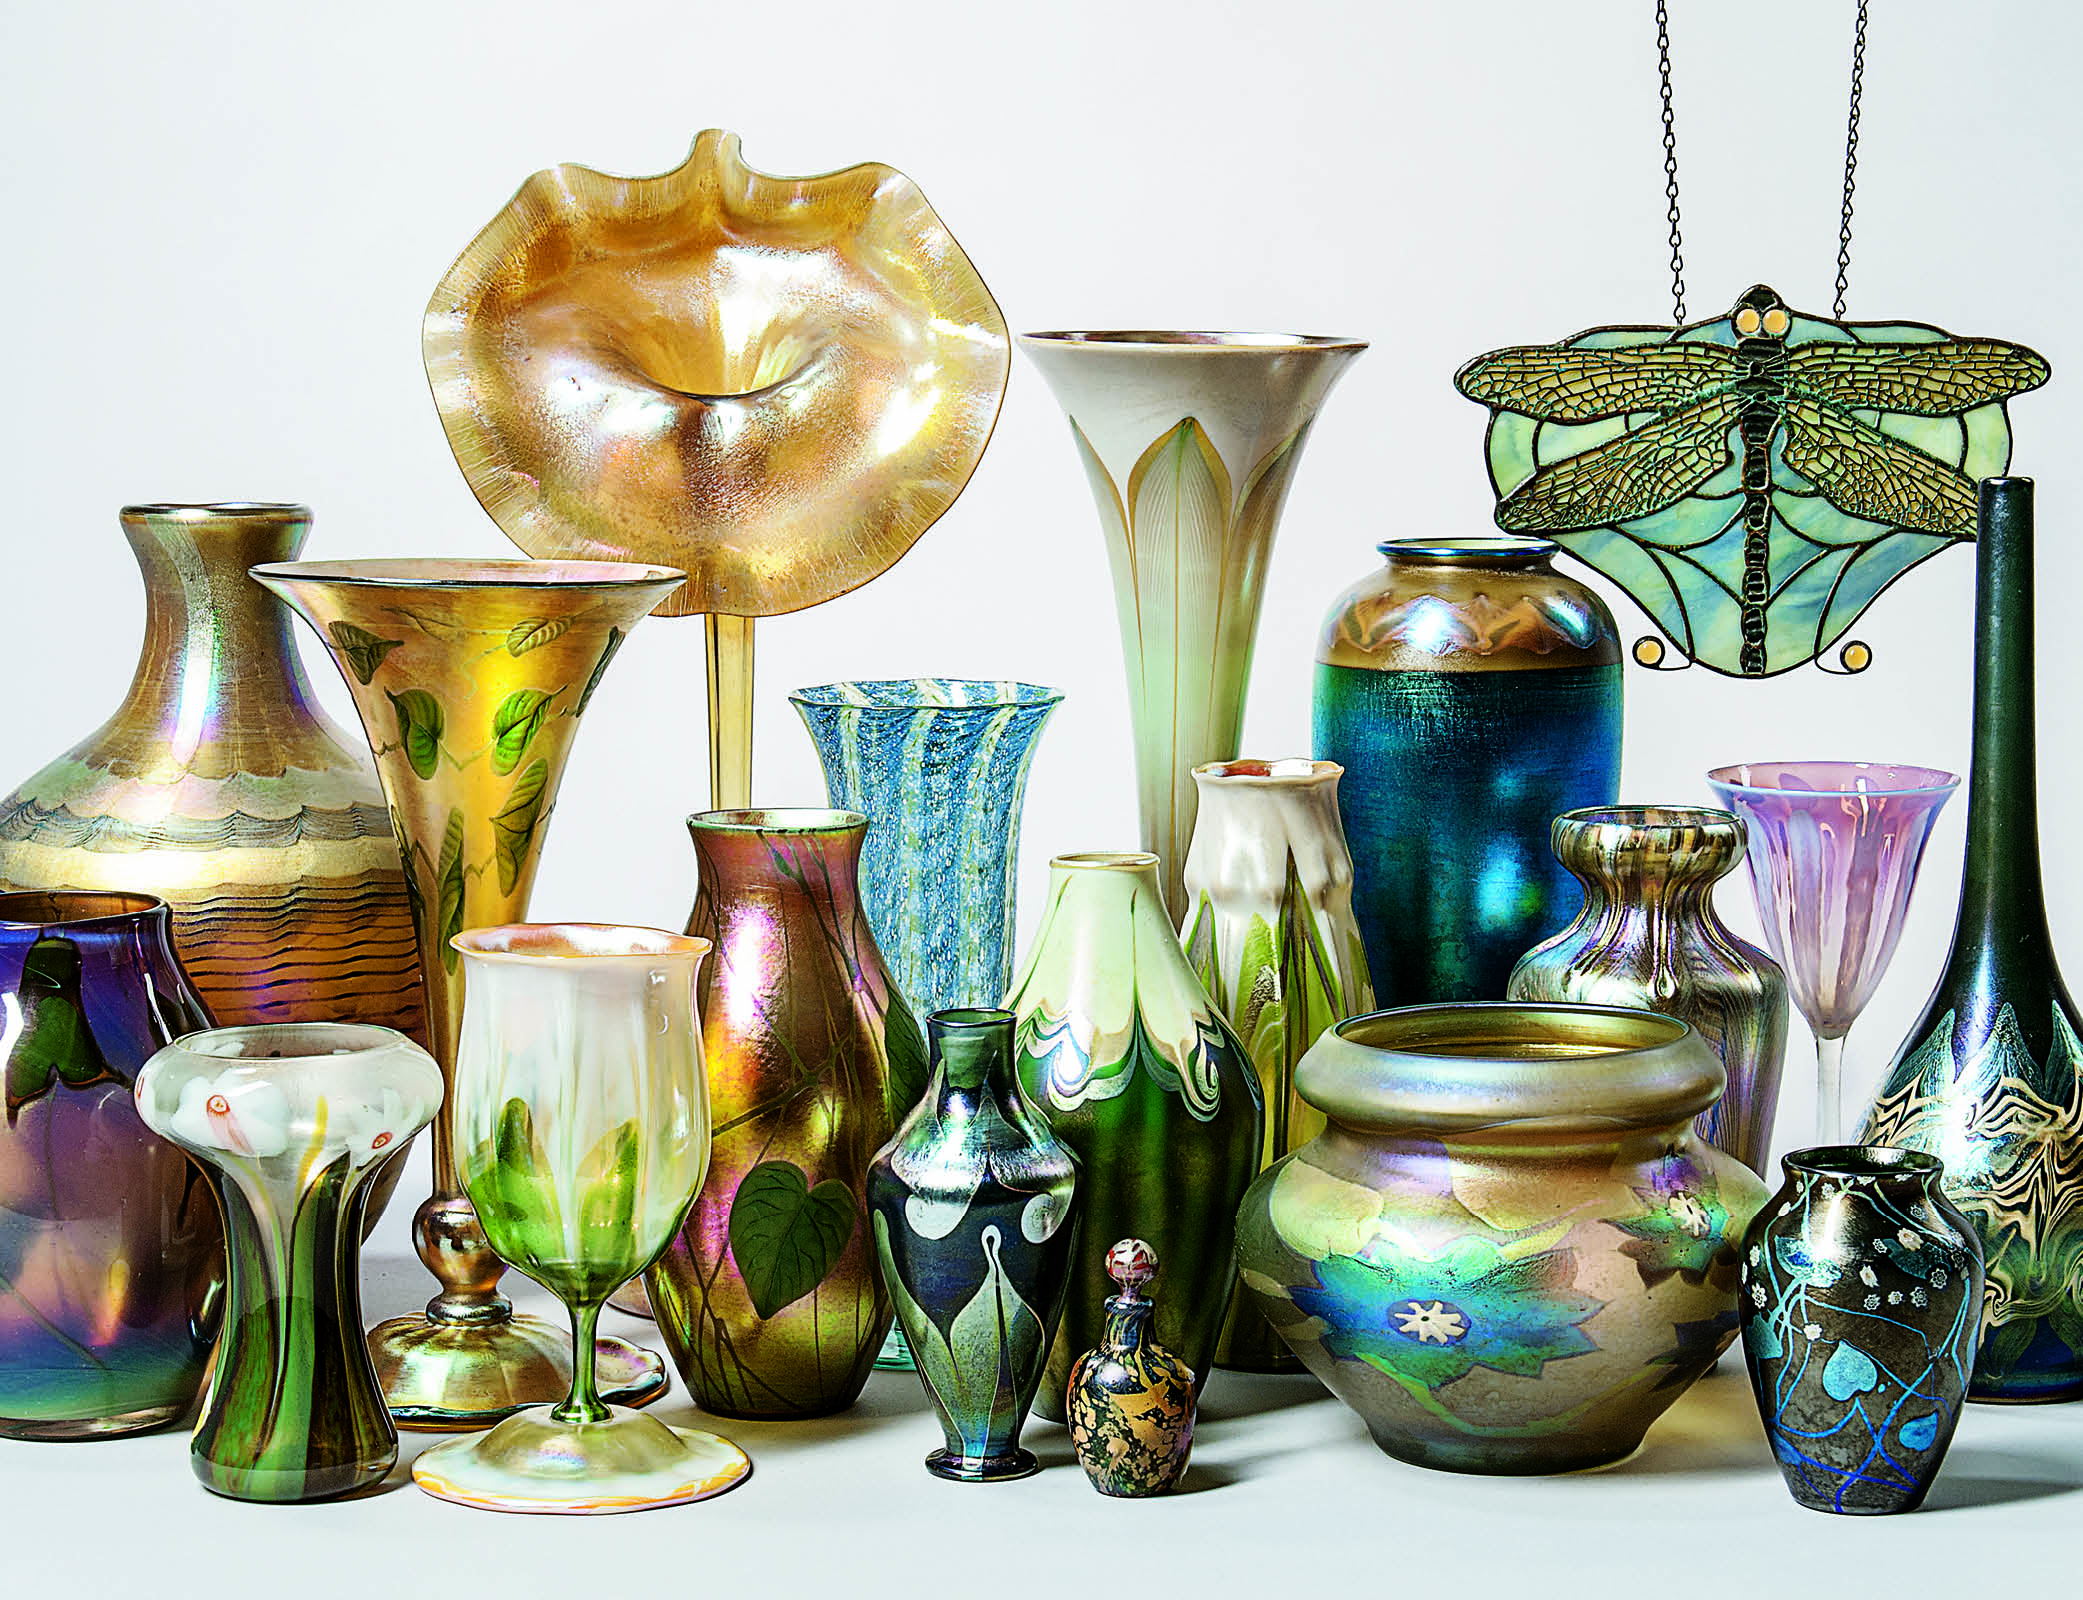 The Nan Edwards Art Glass Collection